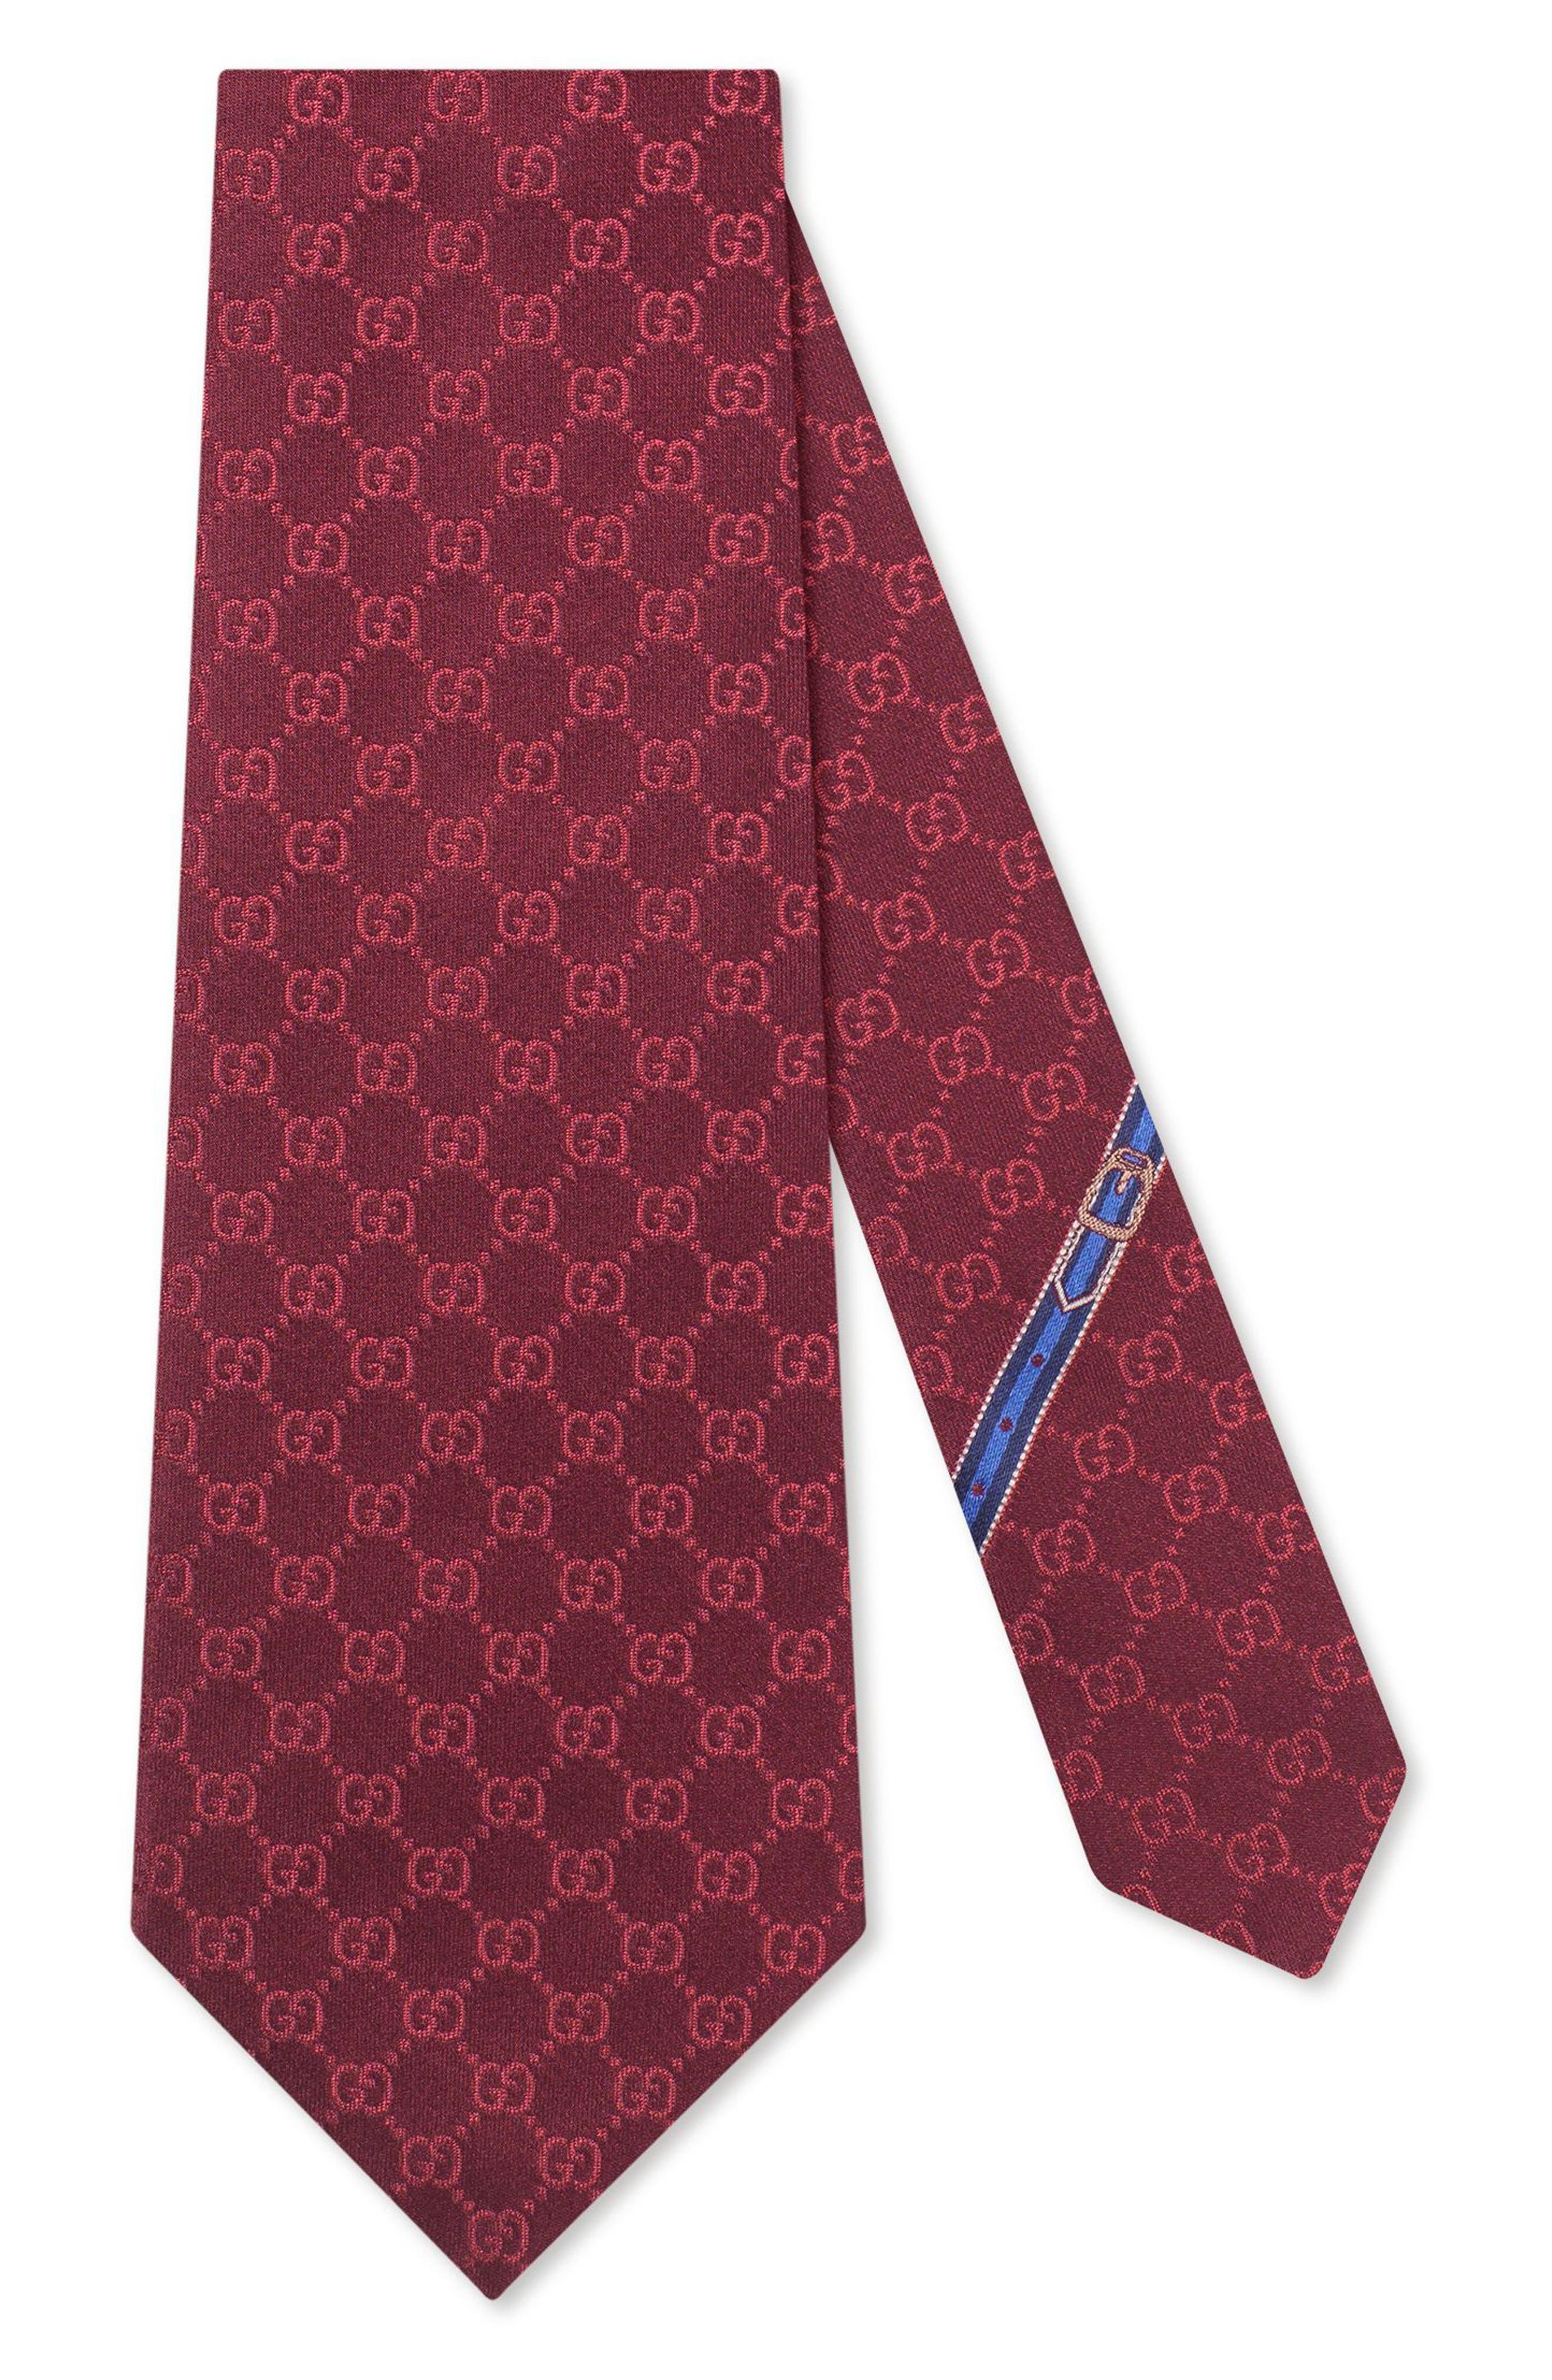 Main Image - Gucci Fedra Silk Jacquard Tie